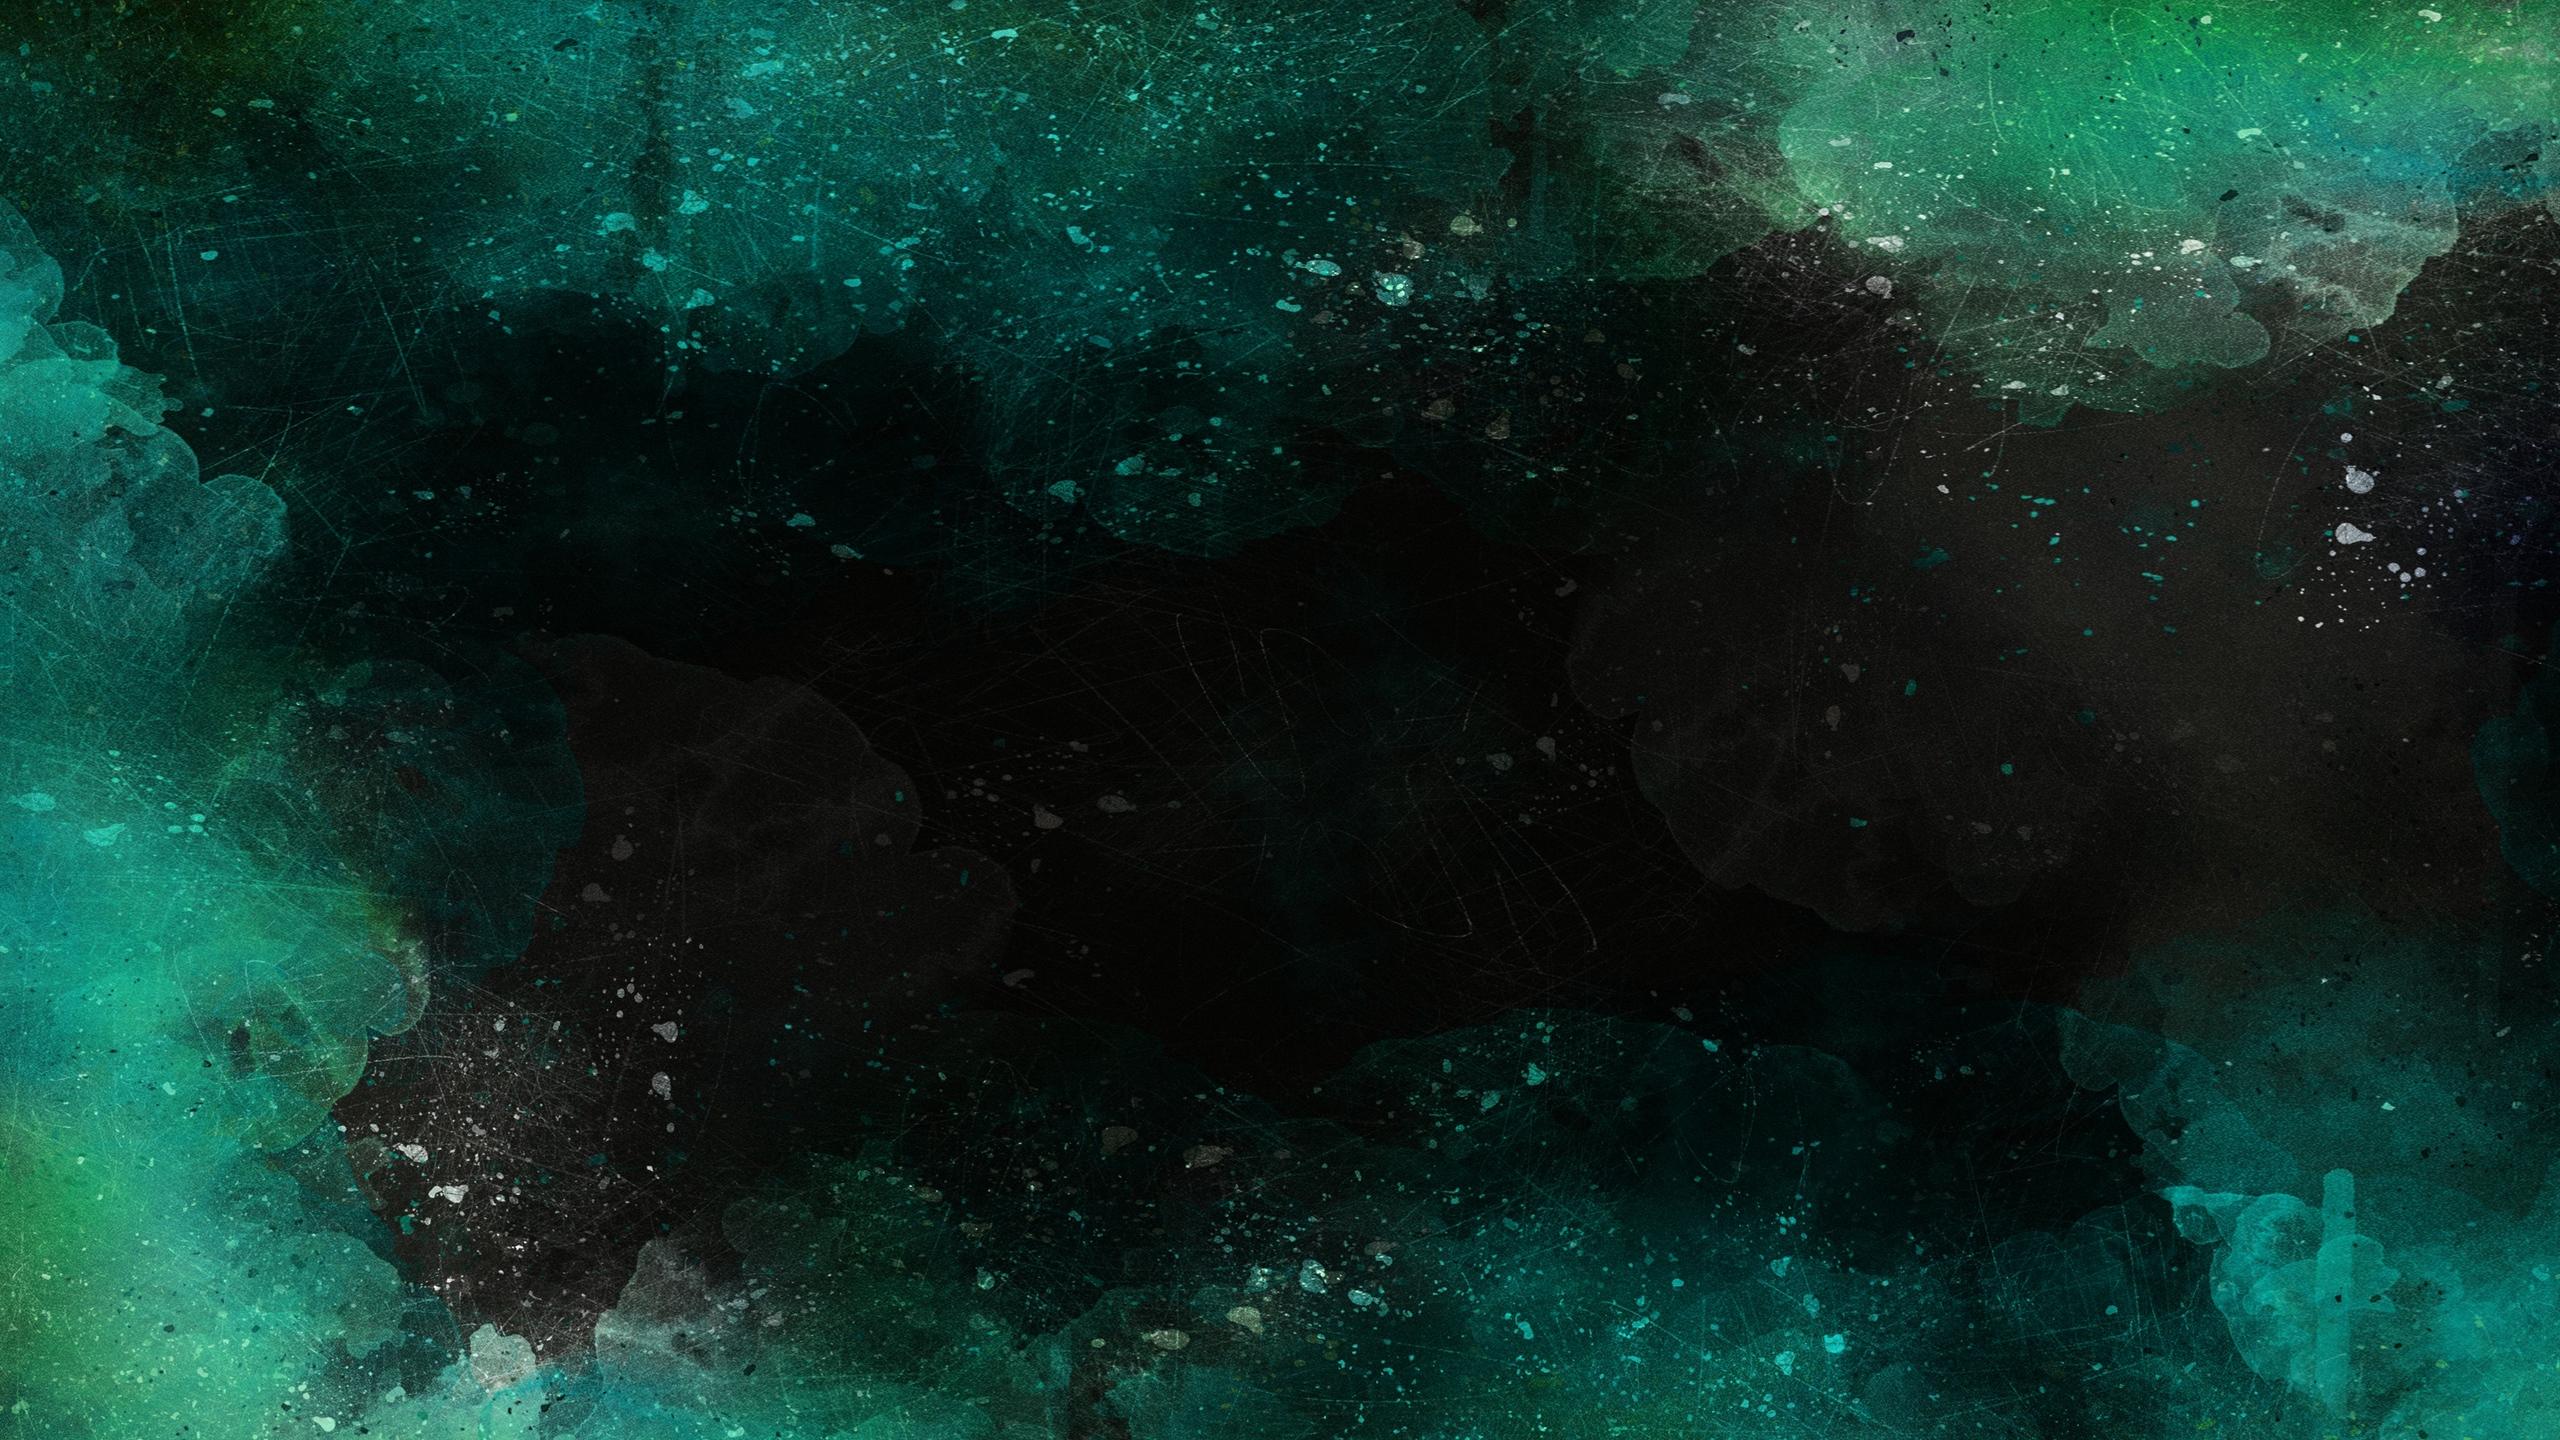 2560x1440 Download Wallpaper 2560x1440 Abstraction, Watercolor, Dark, Spots